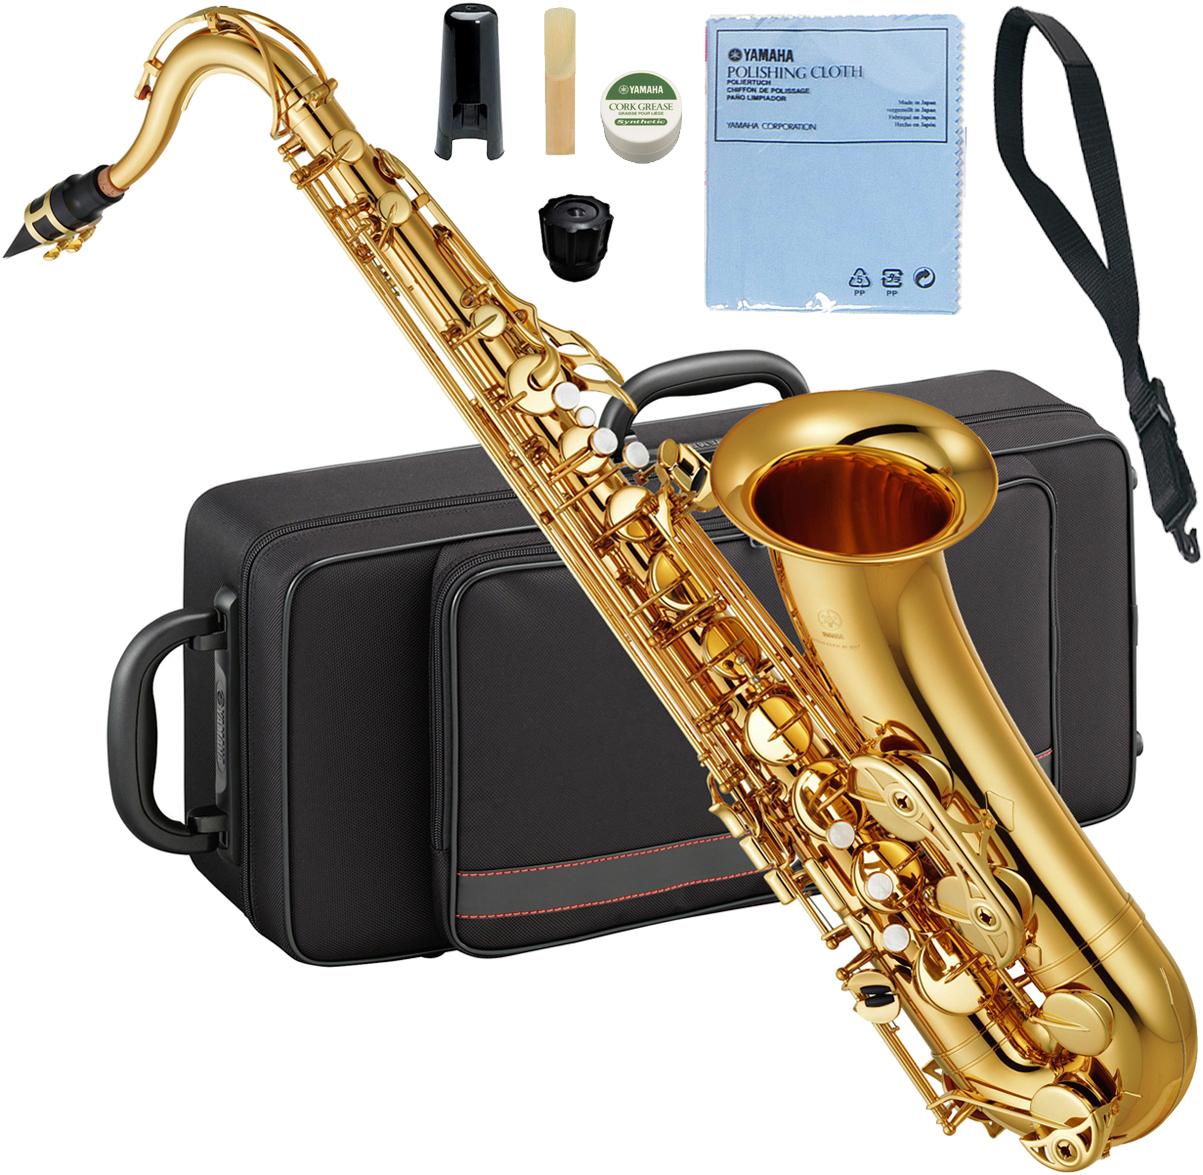 YAMAHA ( ヤマハ ) YTS-380 テナーサックス 正規品 管楽器 tenor saxophone サックス 管体 ゴールド 本体 YTS-380-01 北海道 沖縄 離島不可